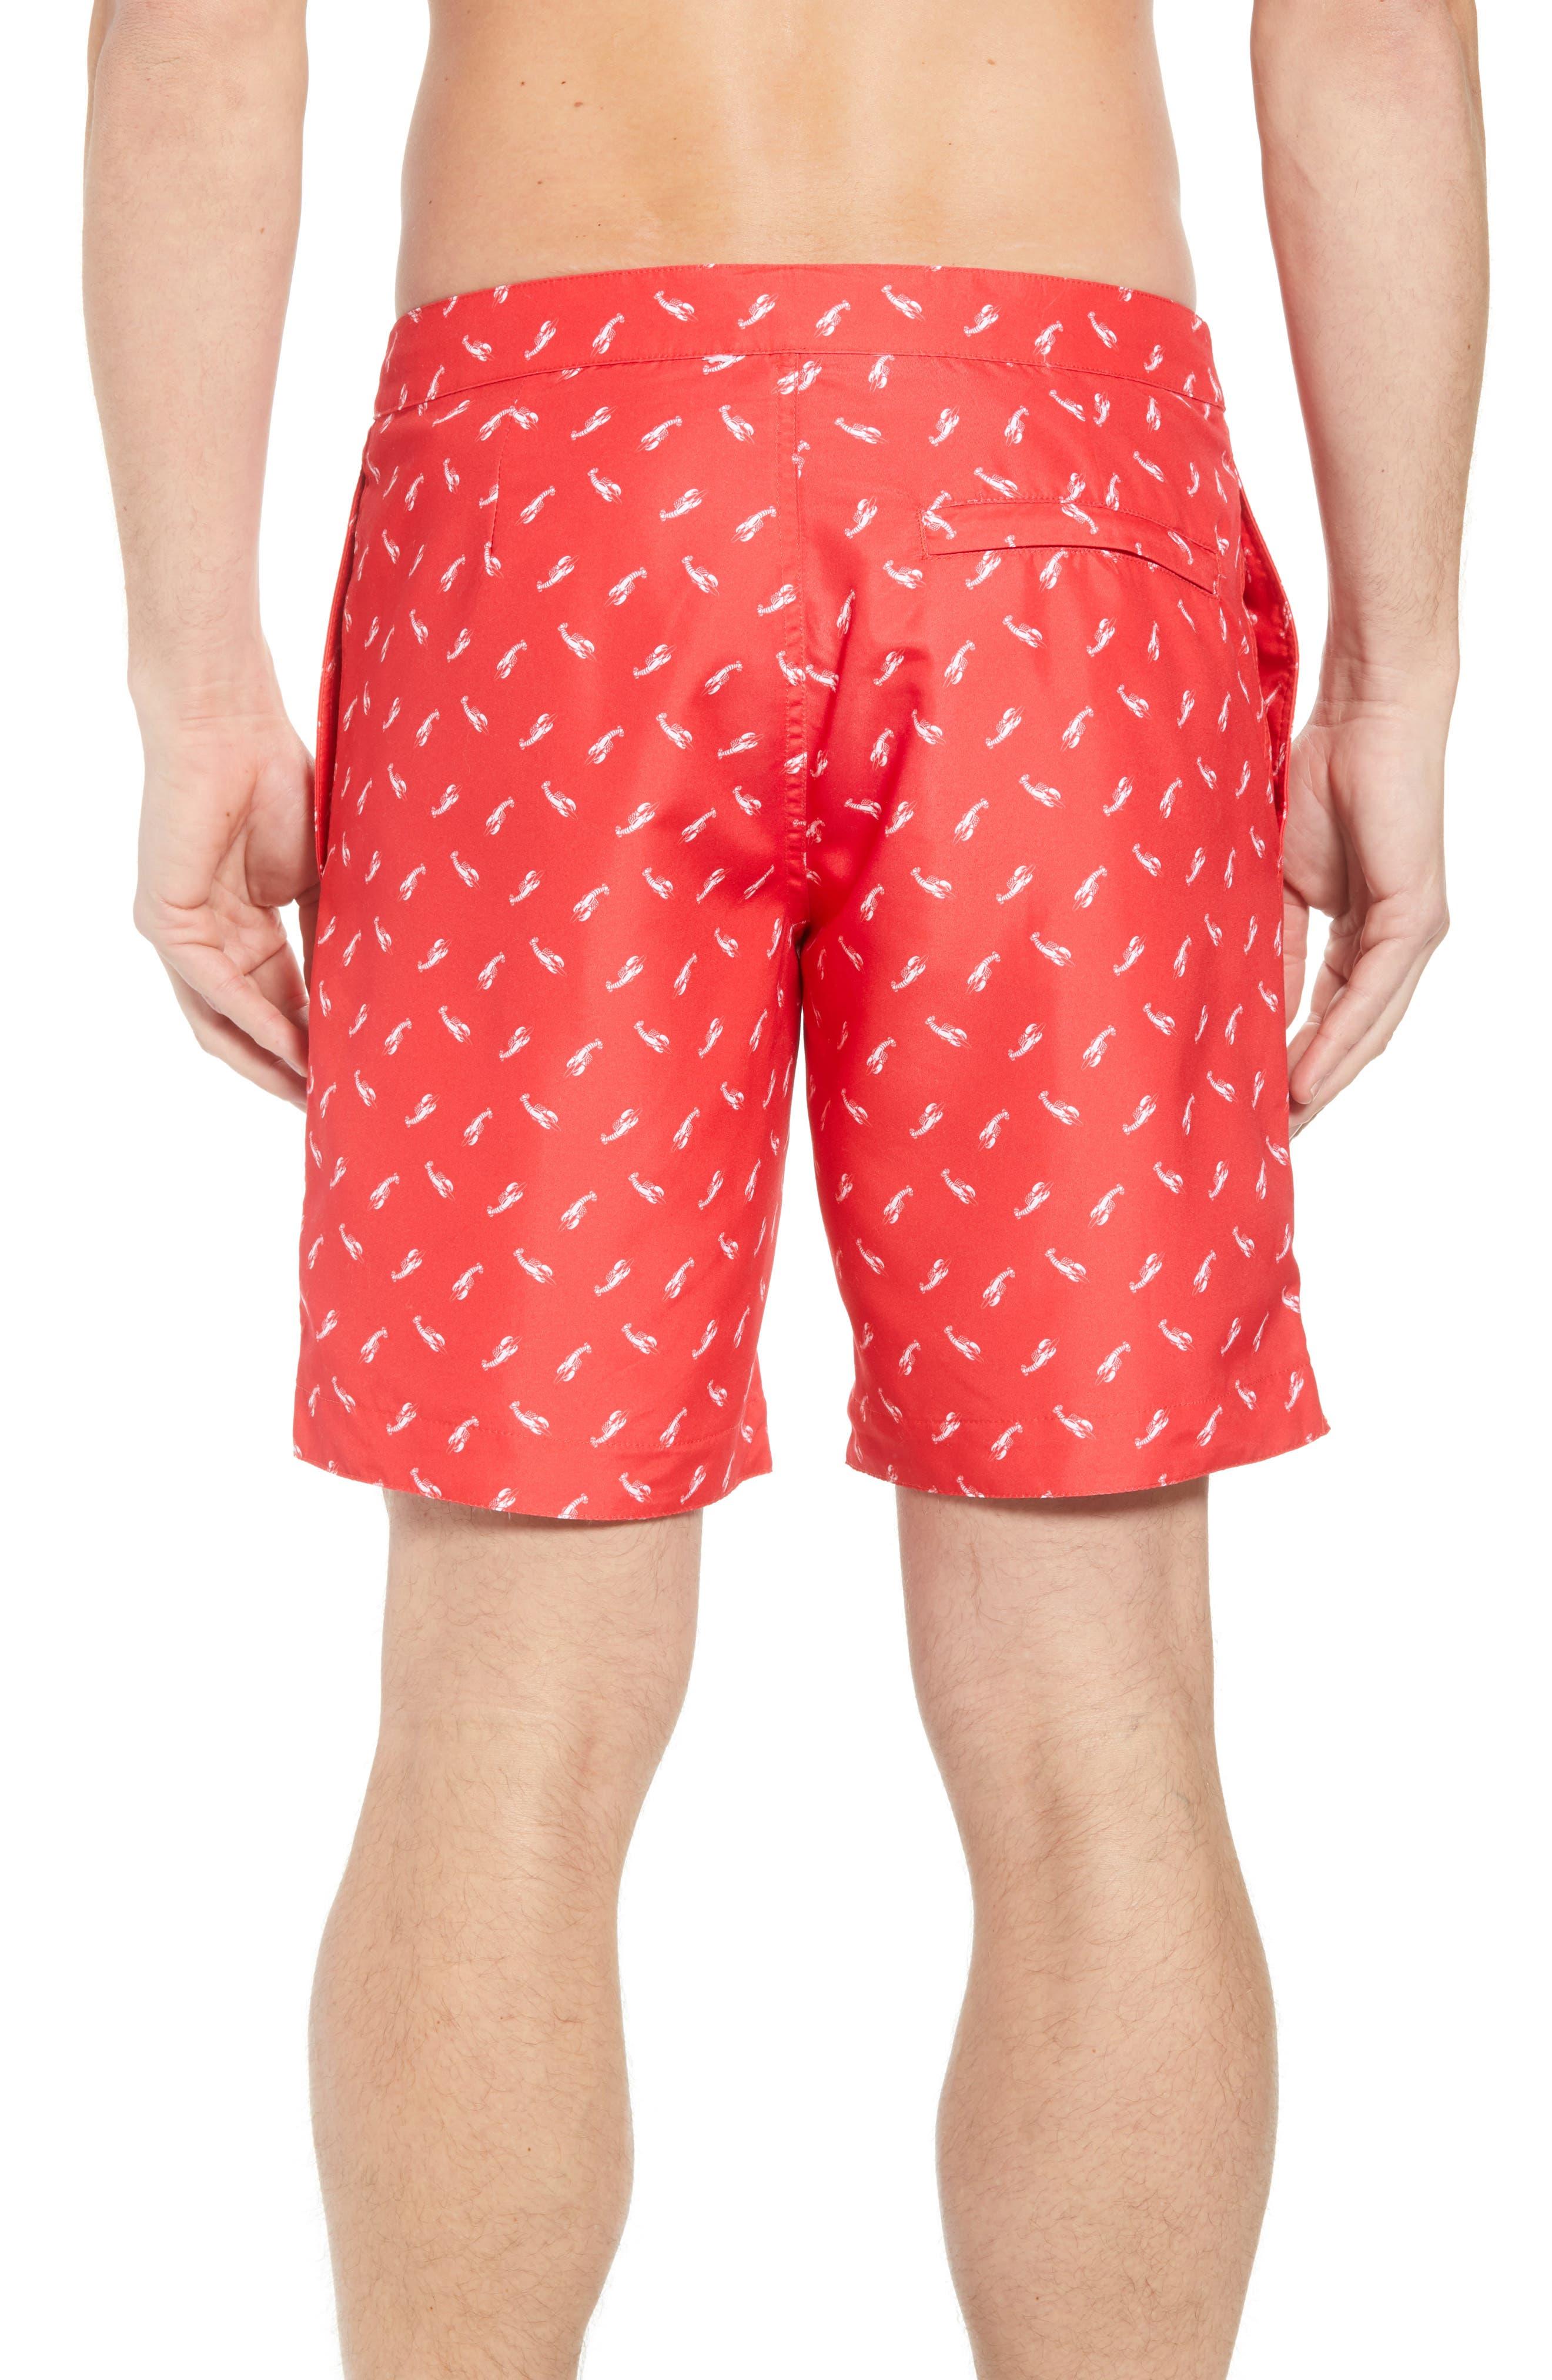 Aruba Slim Fit Swim Trunks,                             Alternate thumbnail 2, color,                             Red Lobsters Print